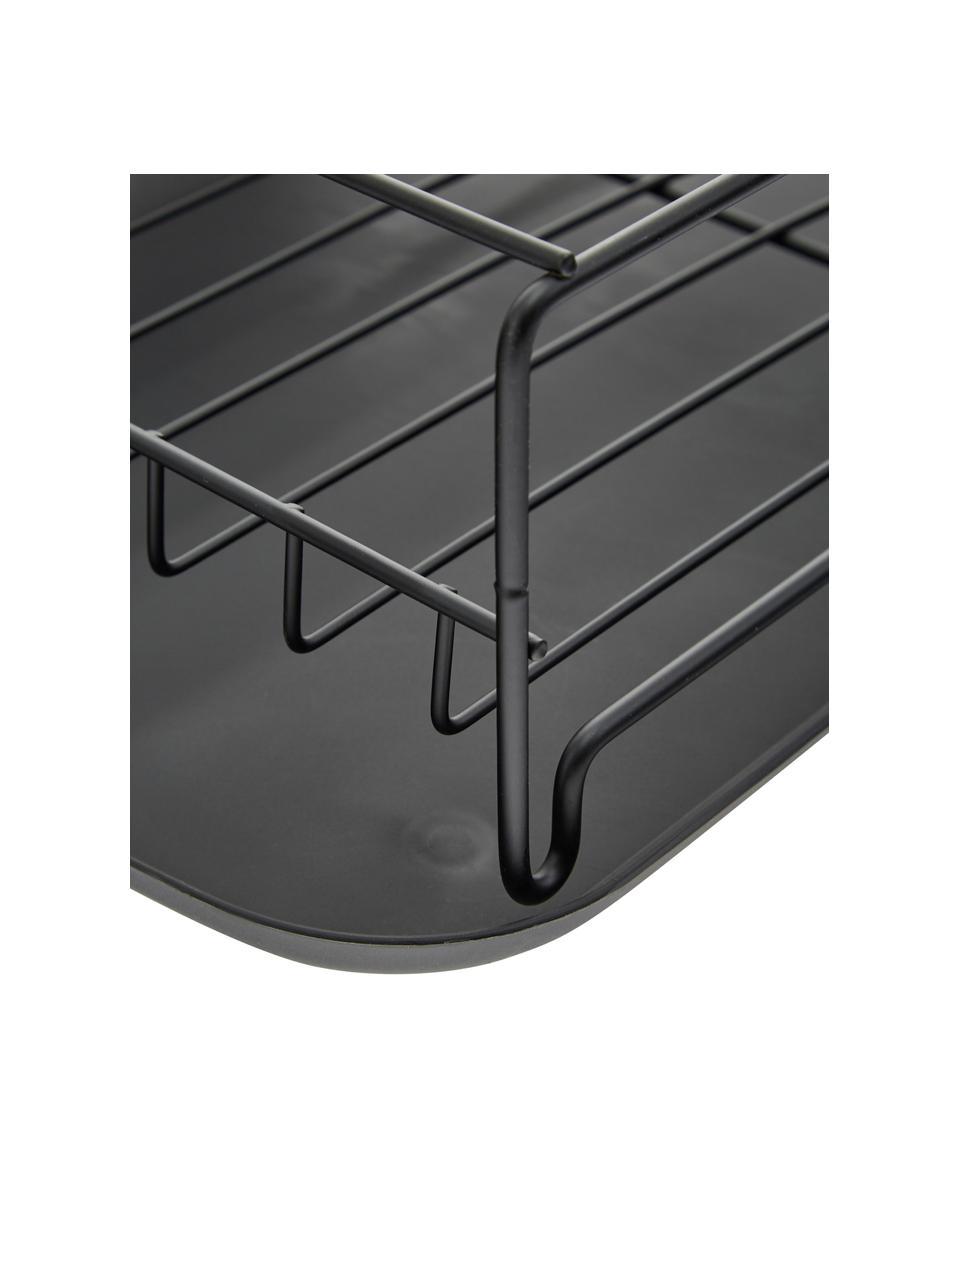 Scolapiatti Discha, Struttura: metallo rivestito, Nero, Larg. 42 x Alt. 12 cm